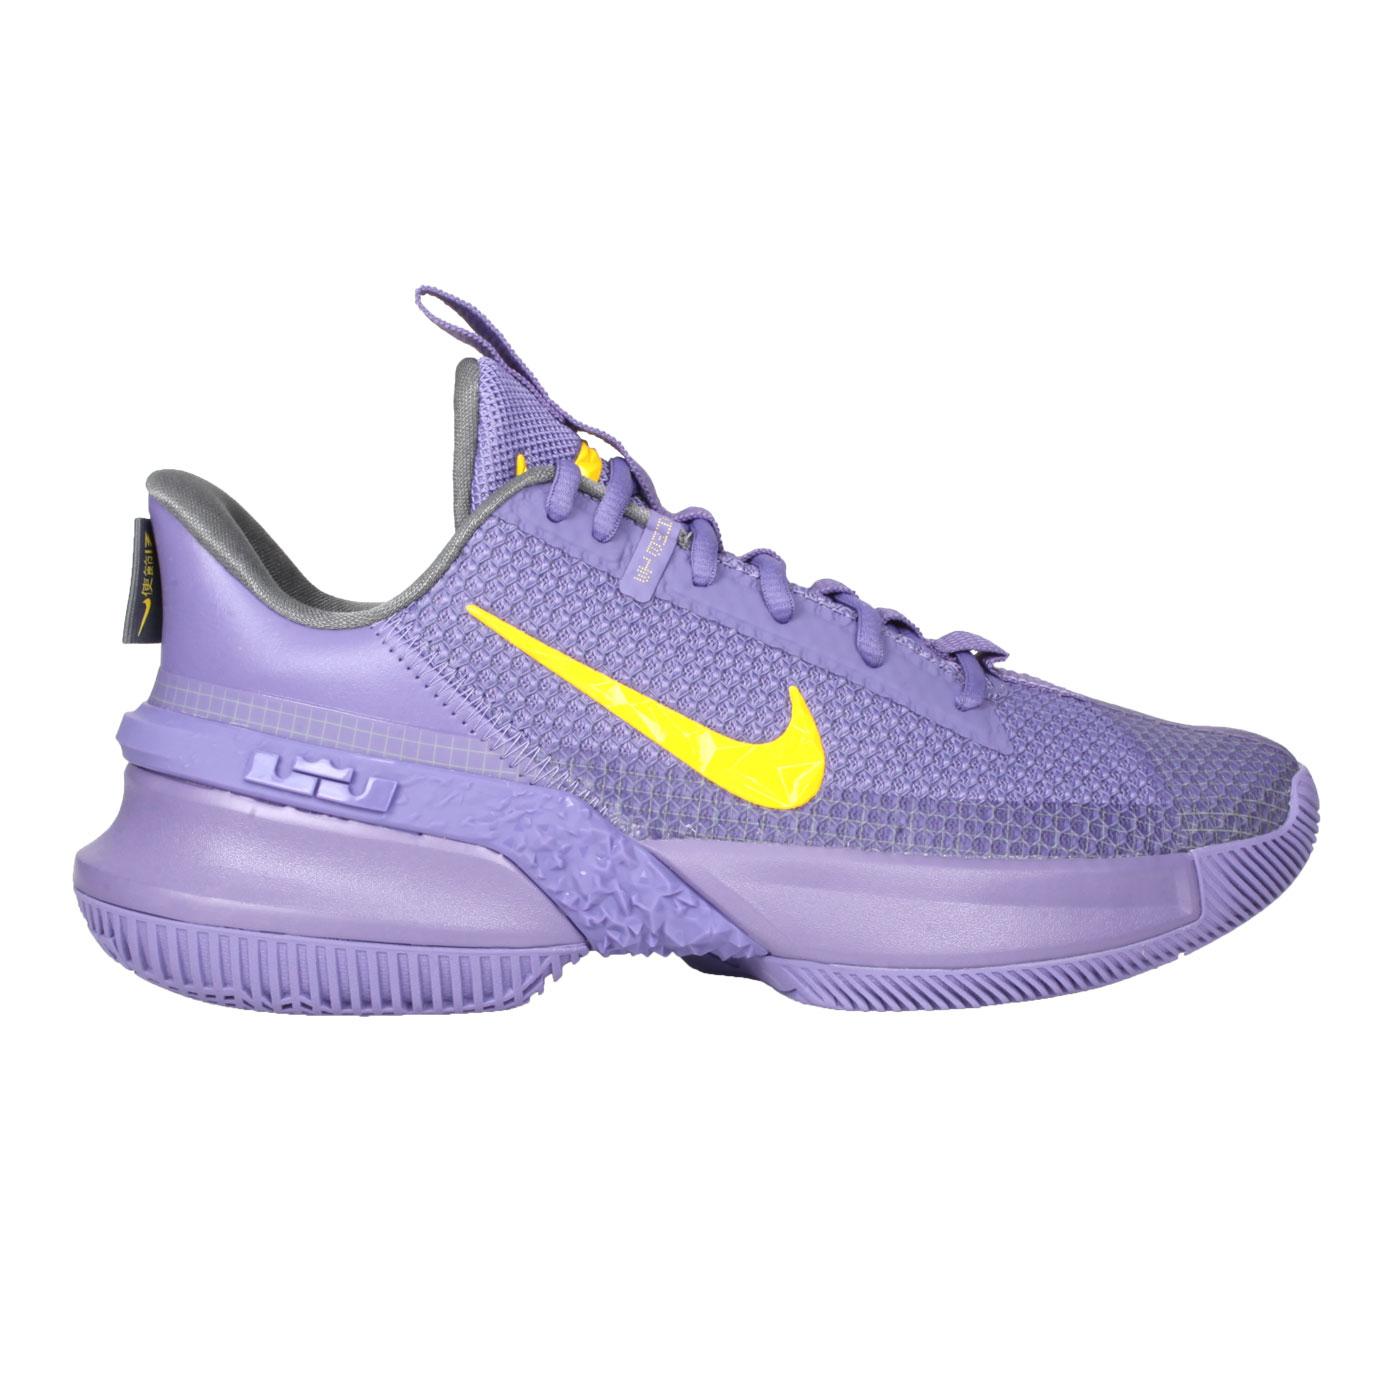 NIKE 限量-男款籃球鞋  @AMBASSADOR XIII@CQ9329500